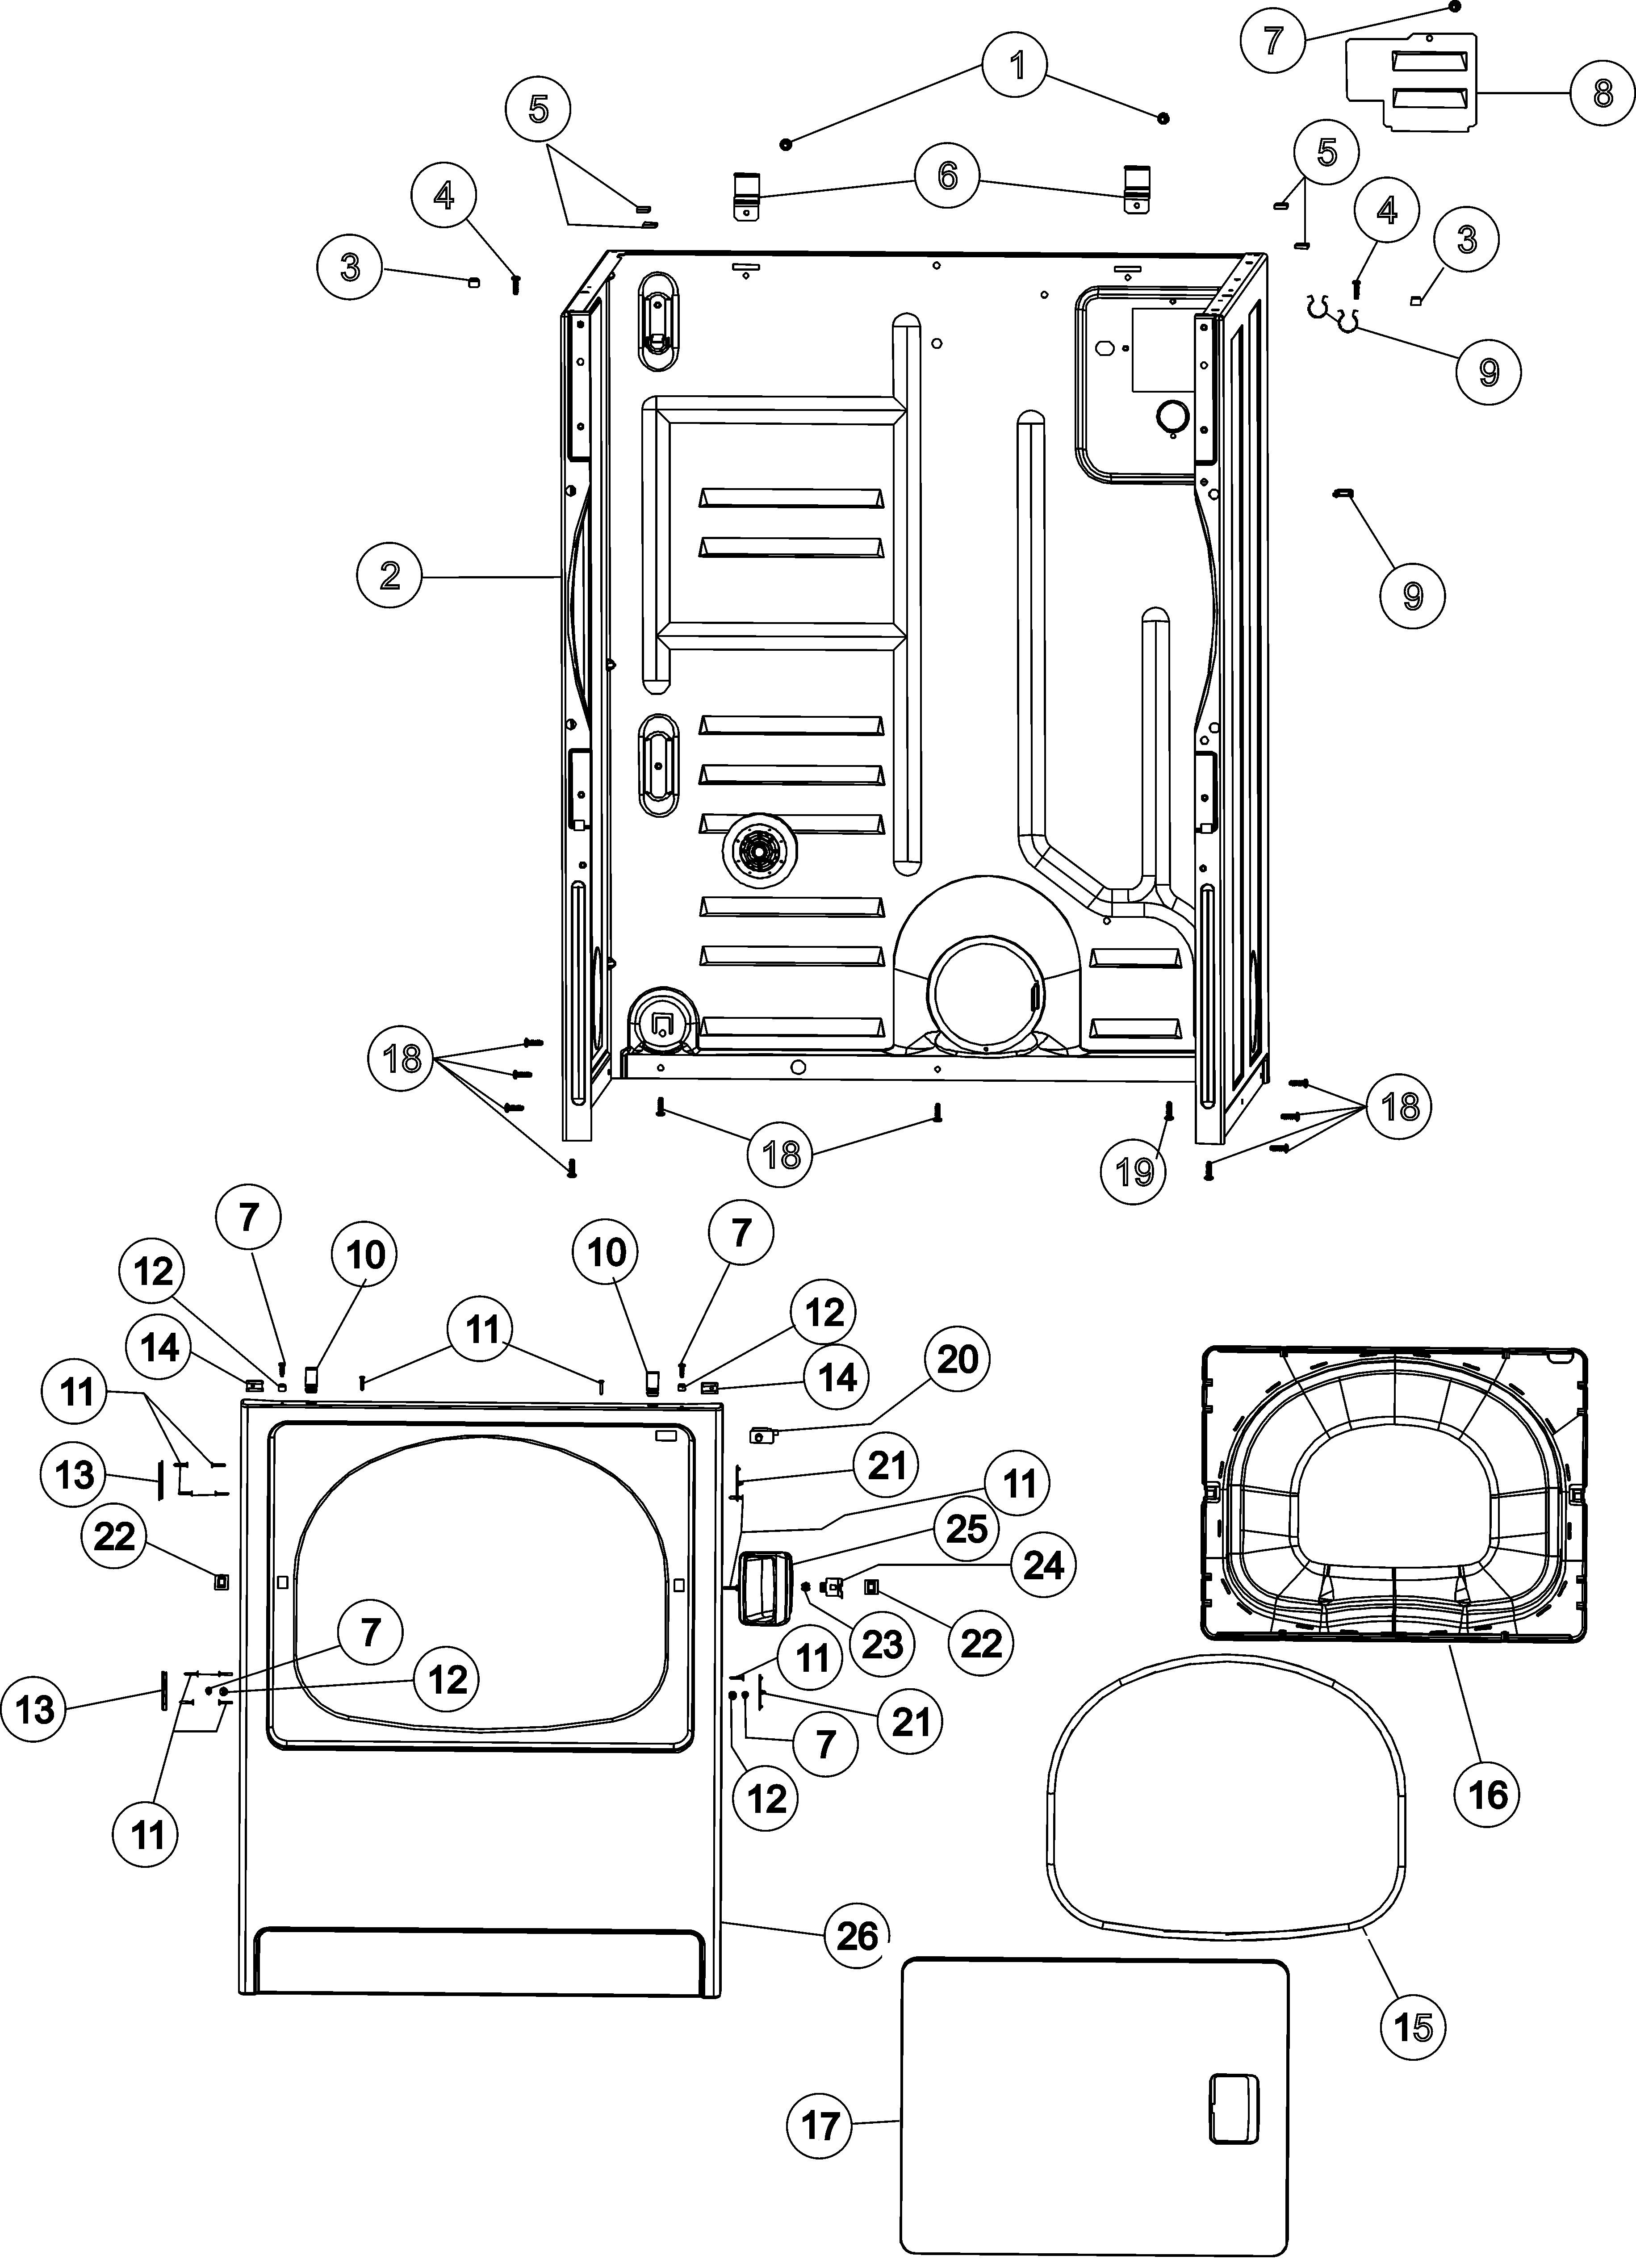 Admiral Dryer Parts Diagram Admiral Model Adg7005aww Residential Dryer Genuine Parts Of Admiral Dryer Parts Diagram